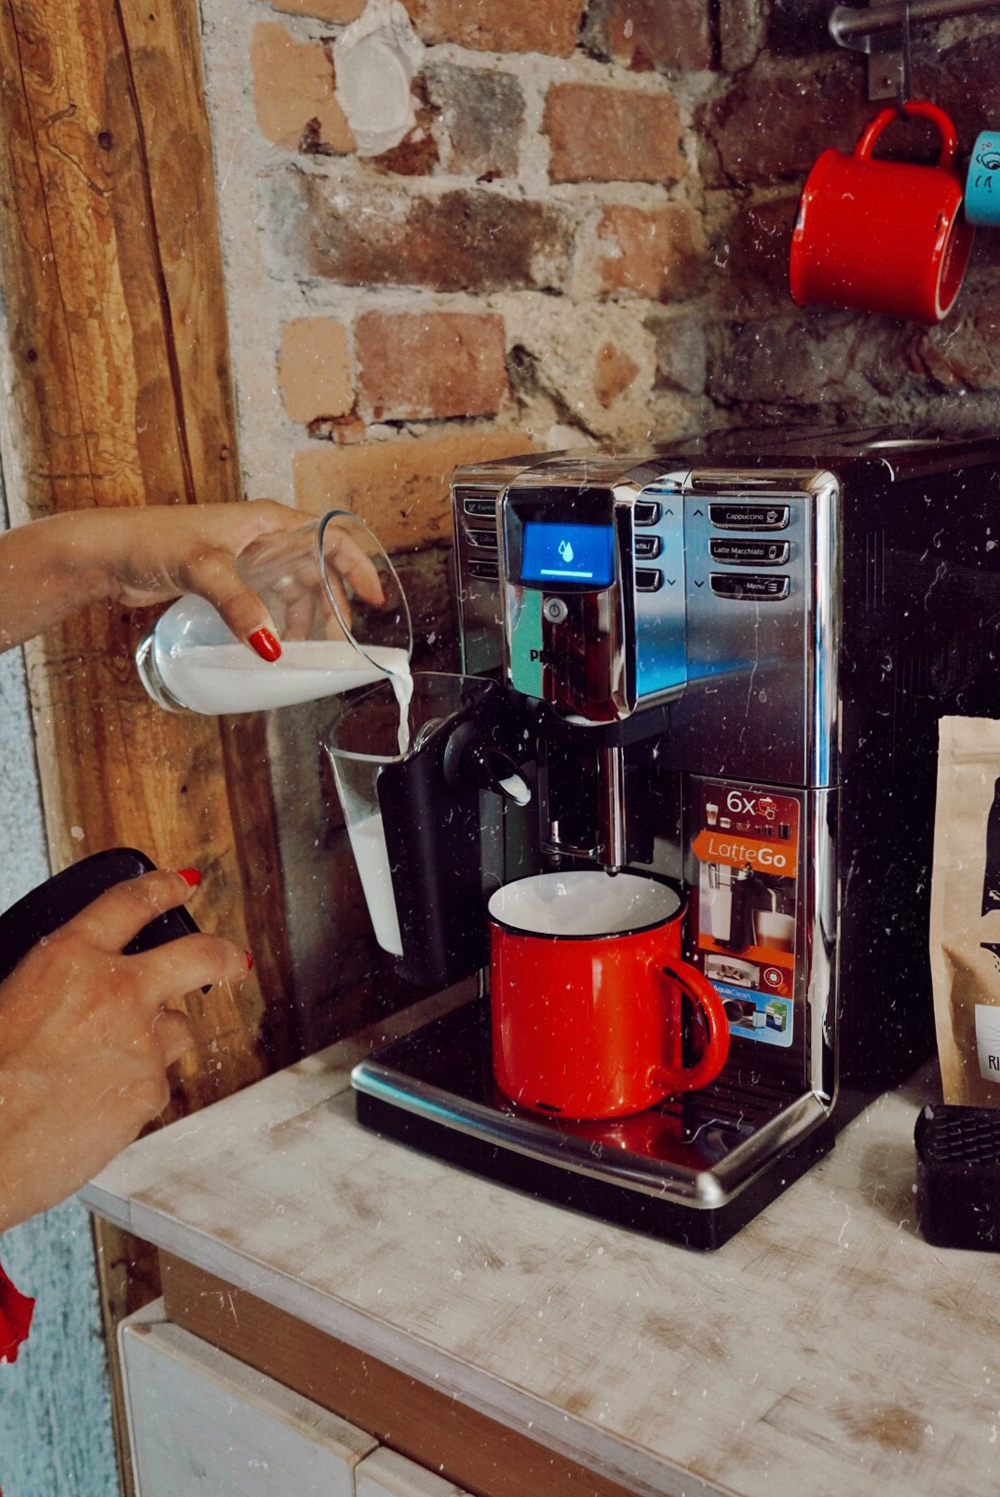 sandra stoicovici cafea philips lattego 5000